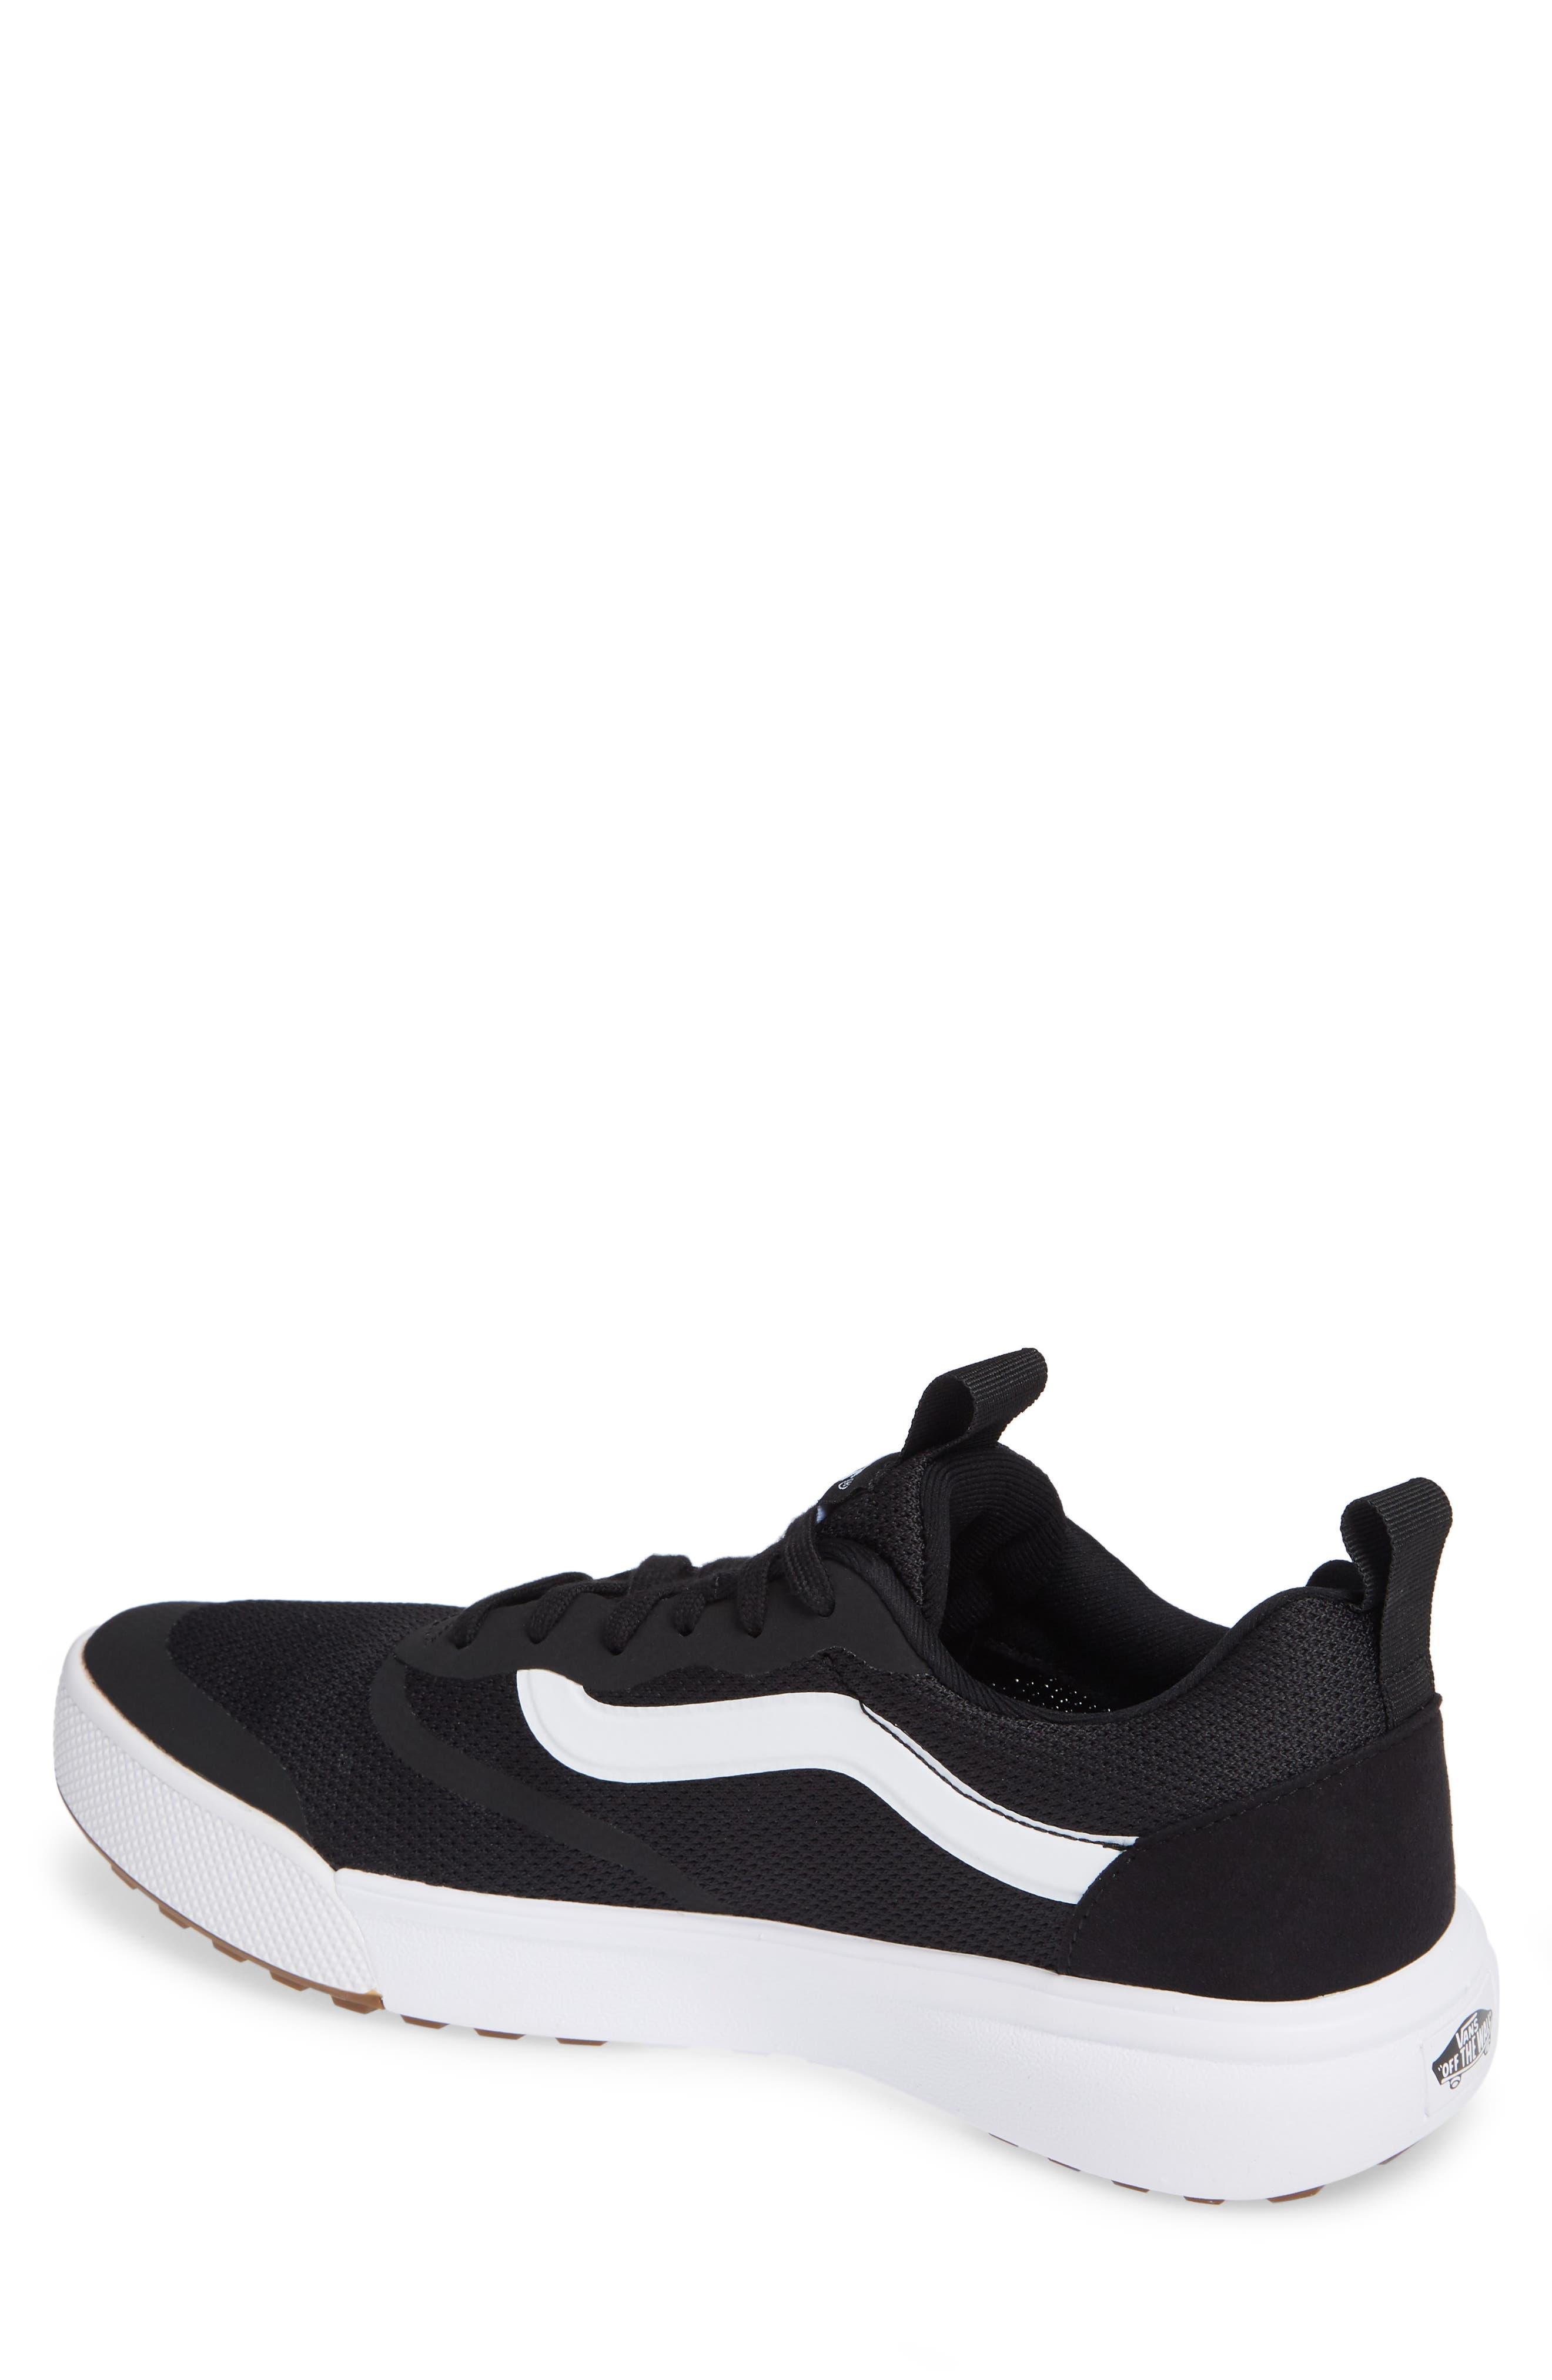 Ultrarange Rapidwield Sneaker,                             Alternate thumbnail 2, color,                             BLACK/ WHITE MESH